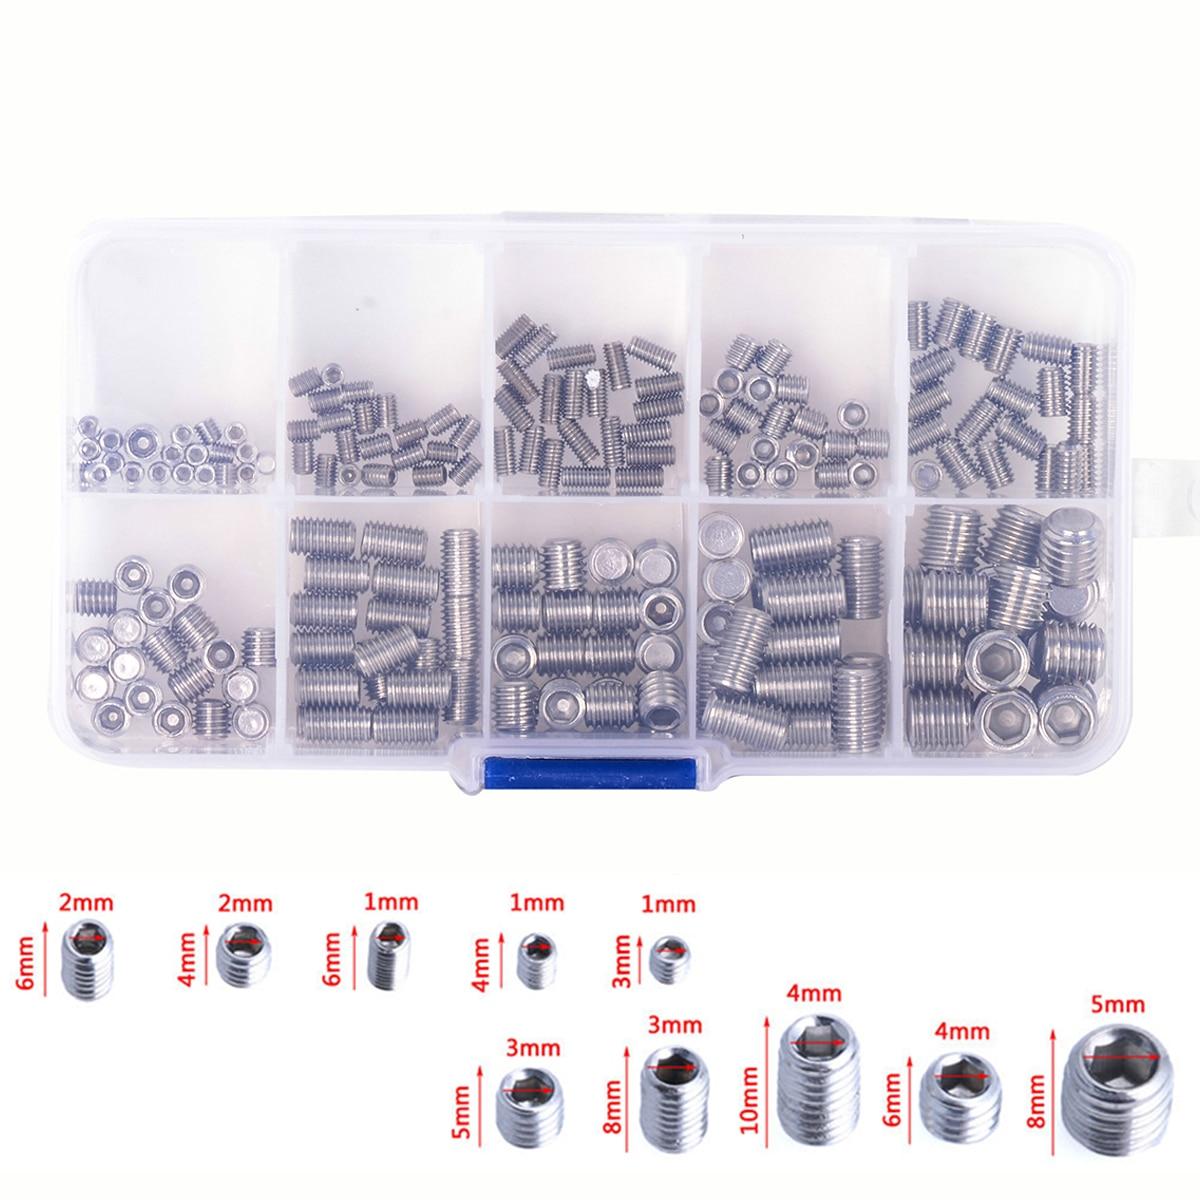 200pcs Stainless Steel Hex Socket Screw Set Mayitr Grub Screws Assortment Kit M3/M4/M5/M6M8 with Box 200pcs 304ss m3 m4 m5 m6 cone point allen head hex socket screws assortment kit